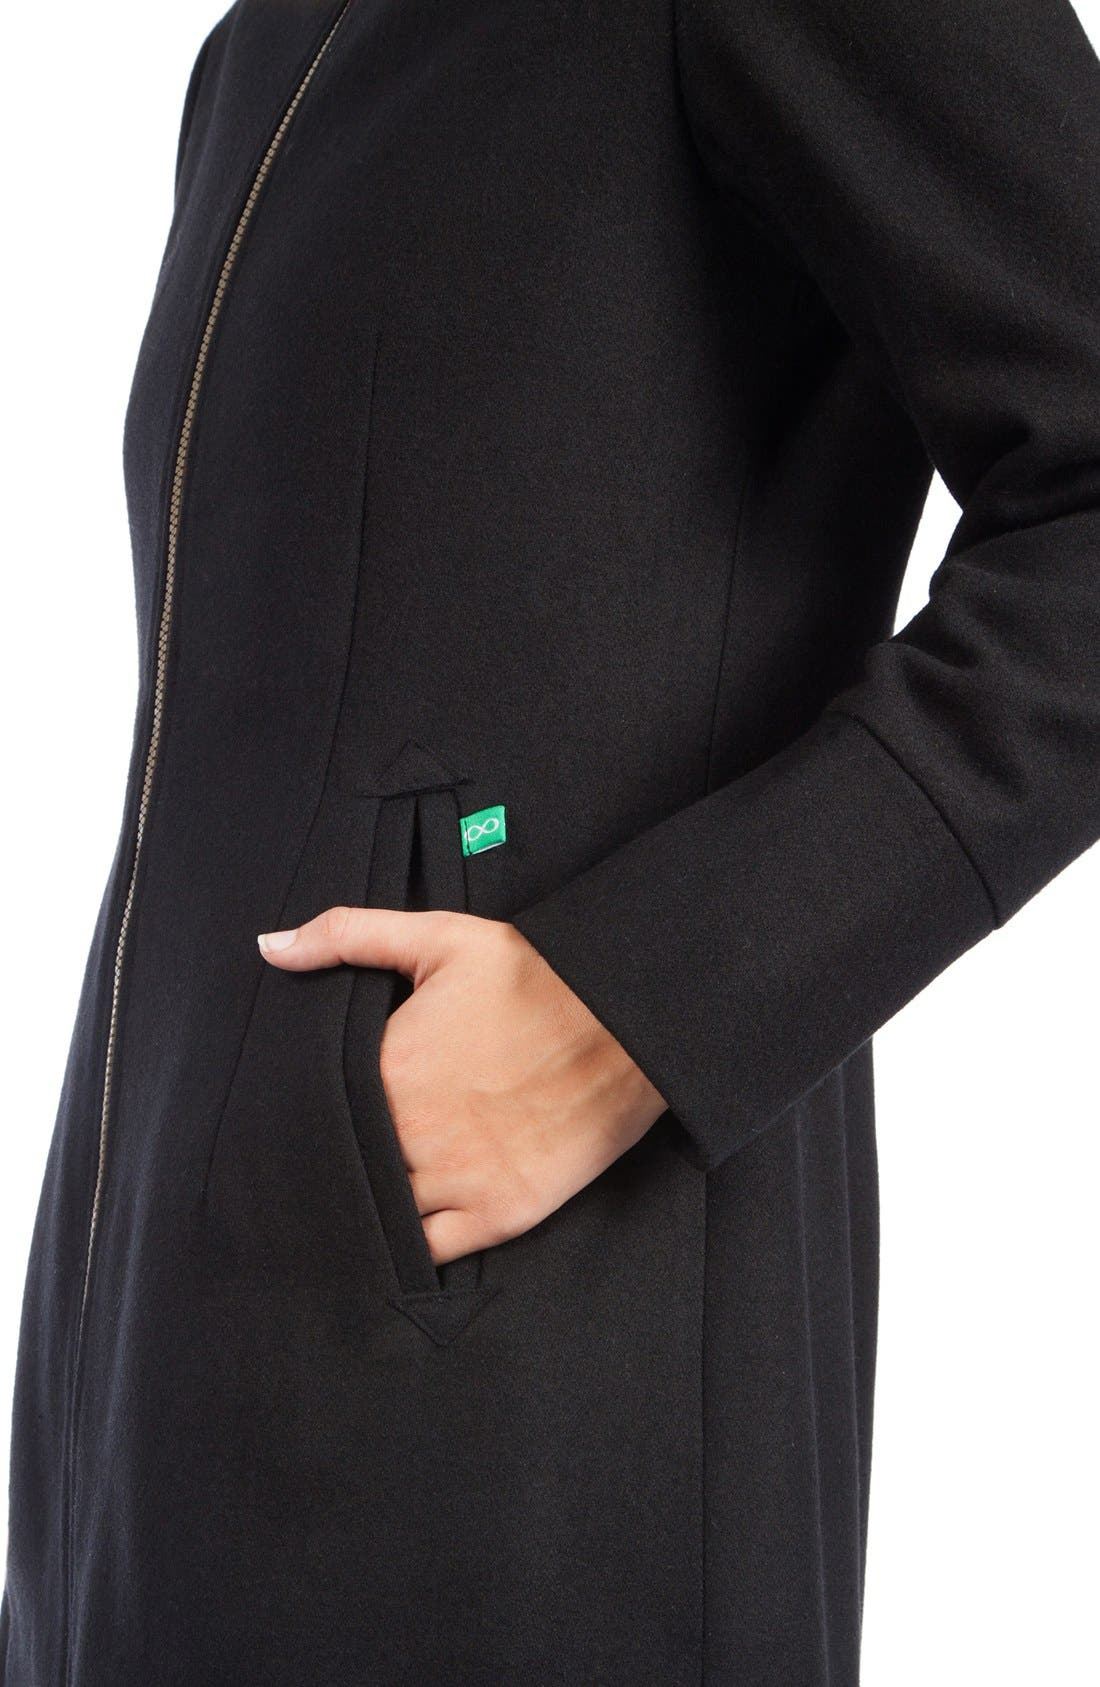 Convertible 3-in-1 Maternity/Nursing Coat,                             Alternate thumbnail 11, color,                             BLACK